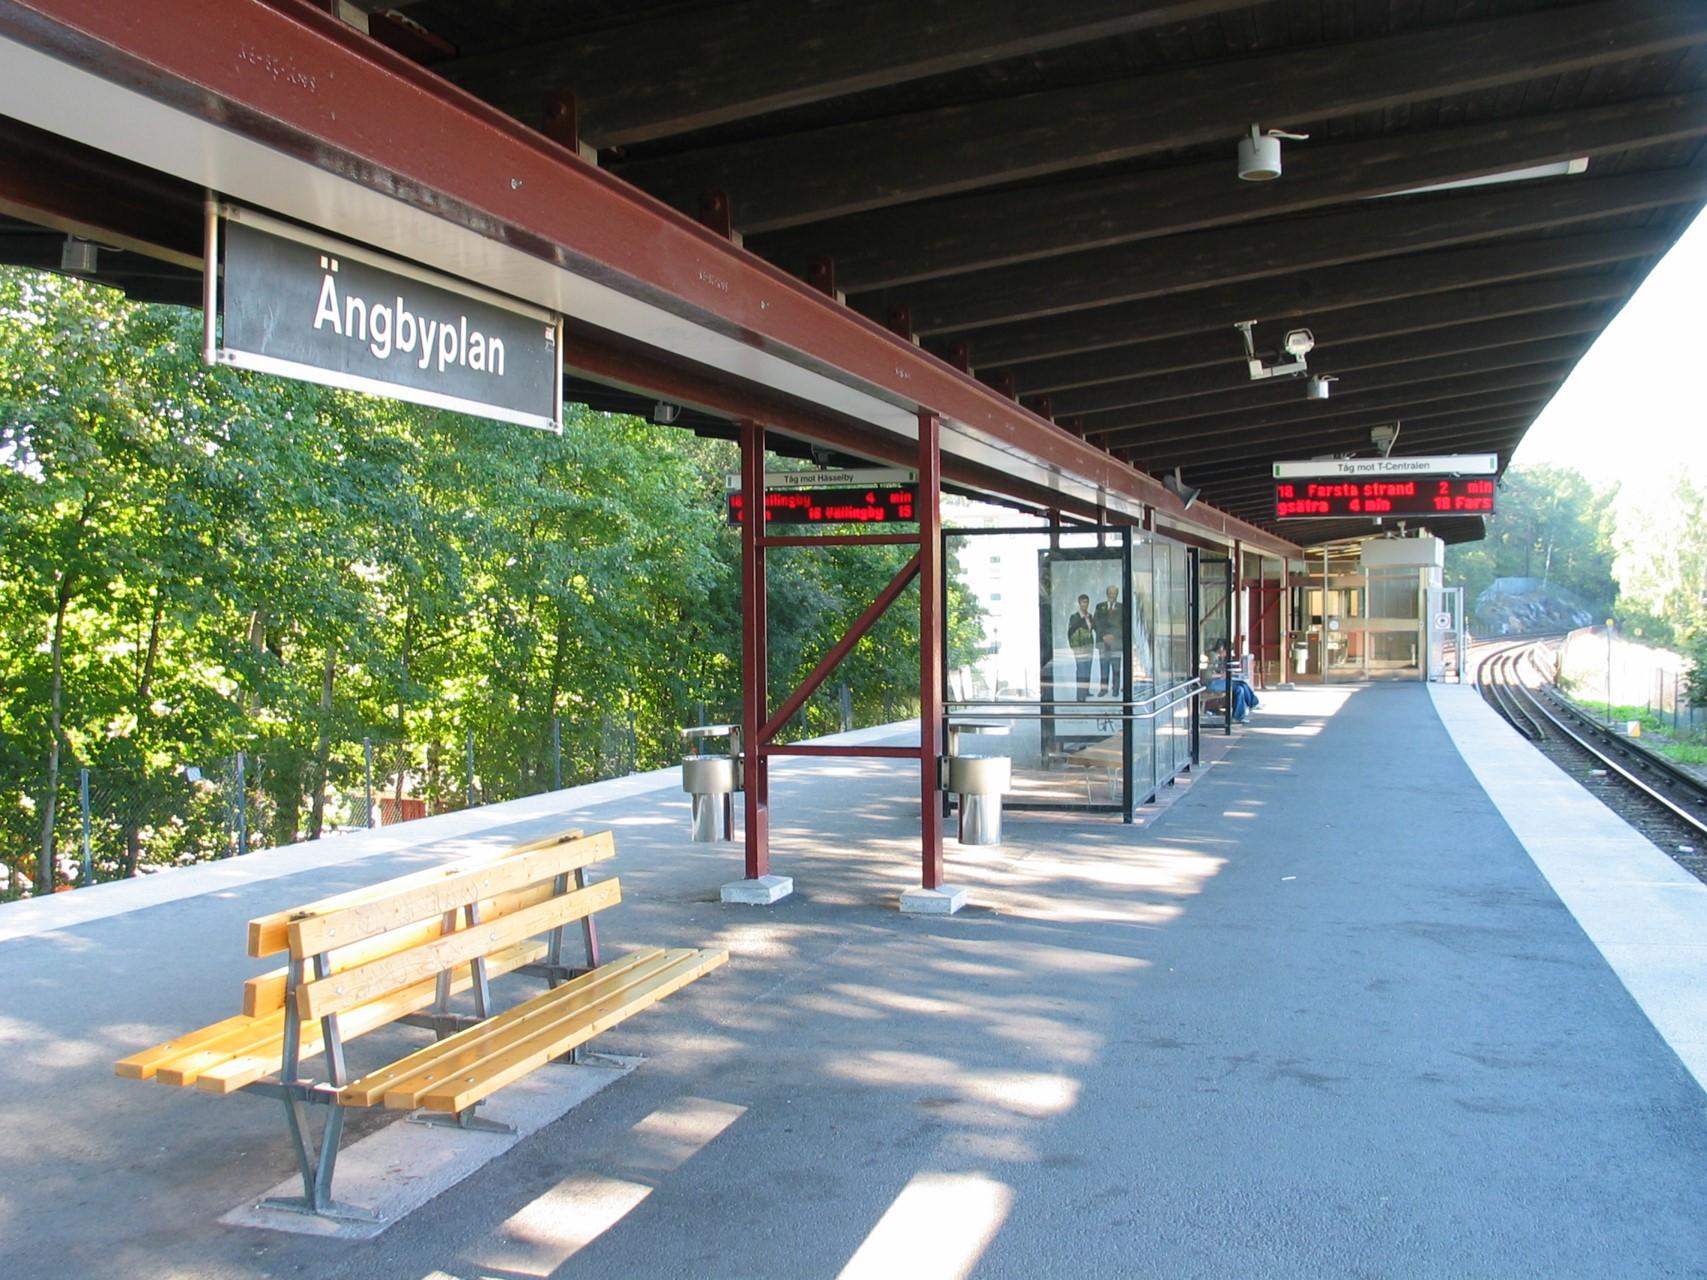 500 m till Ängbyplans T-bana Gröna linjen